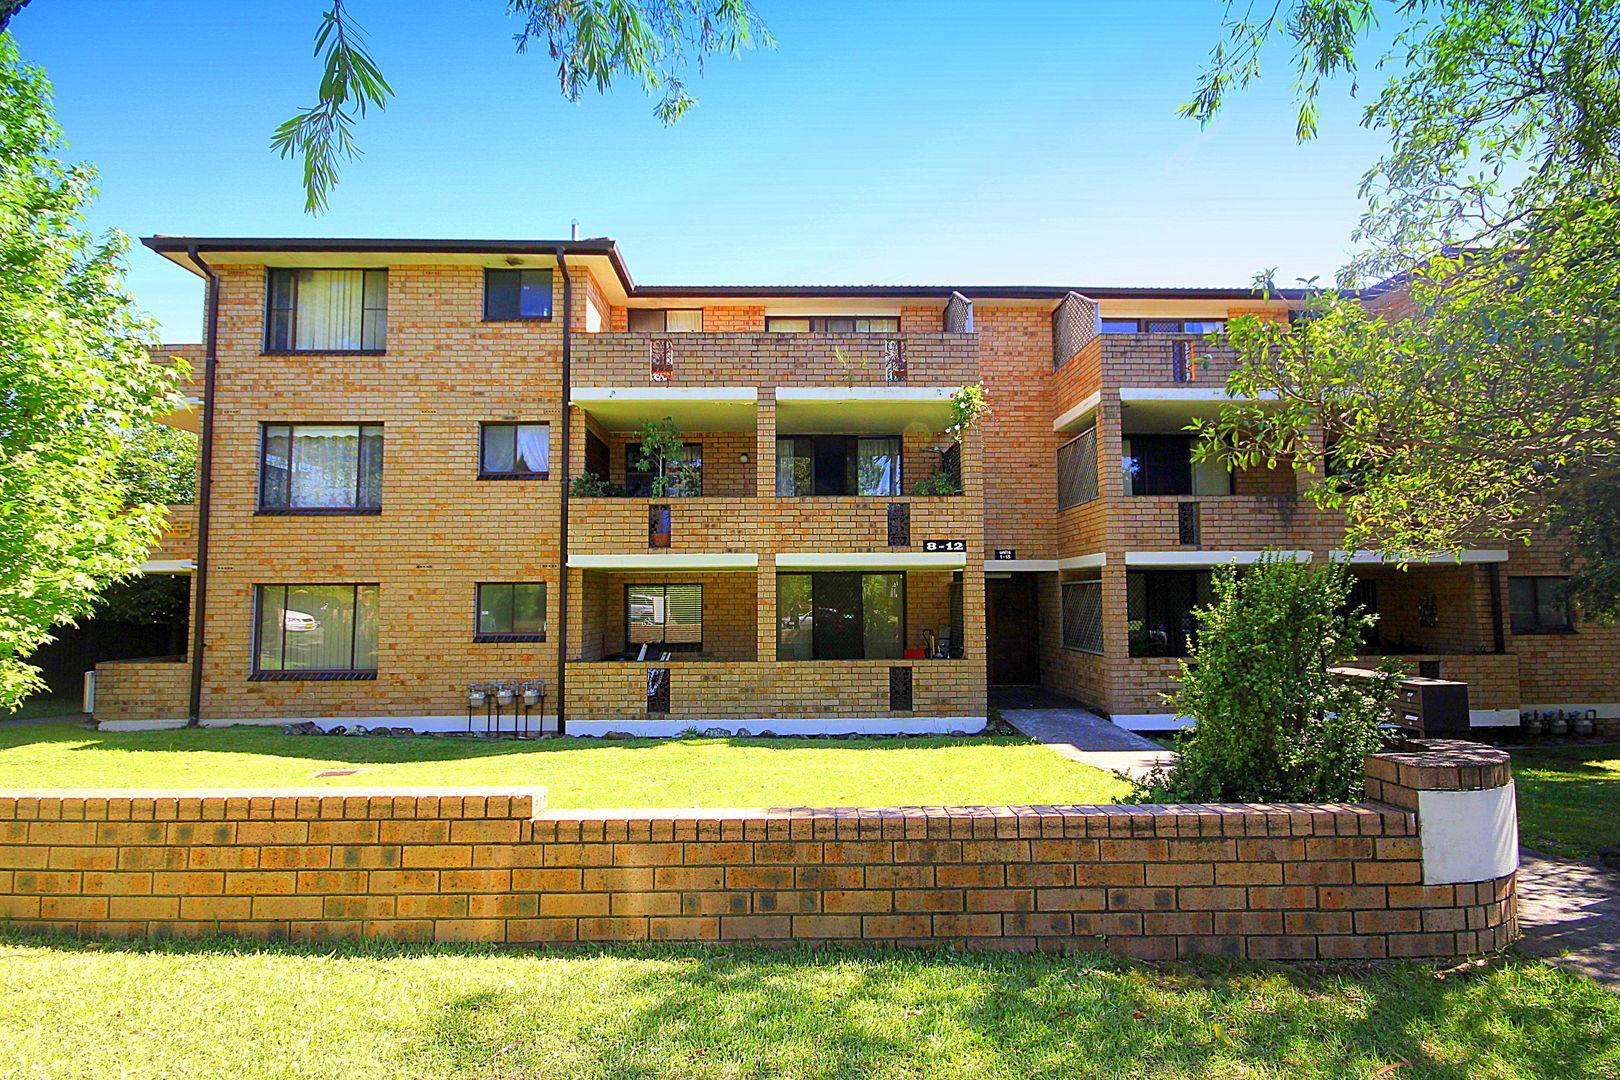 4/8-12 Hixson Street, Bankstown NSW 2200, Image 0